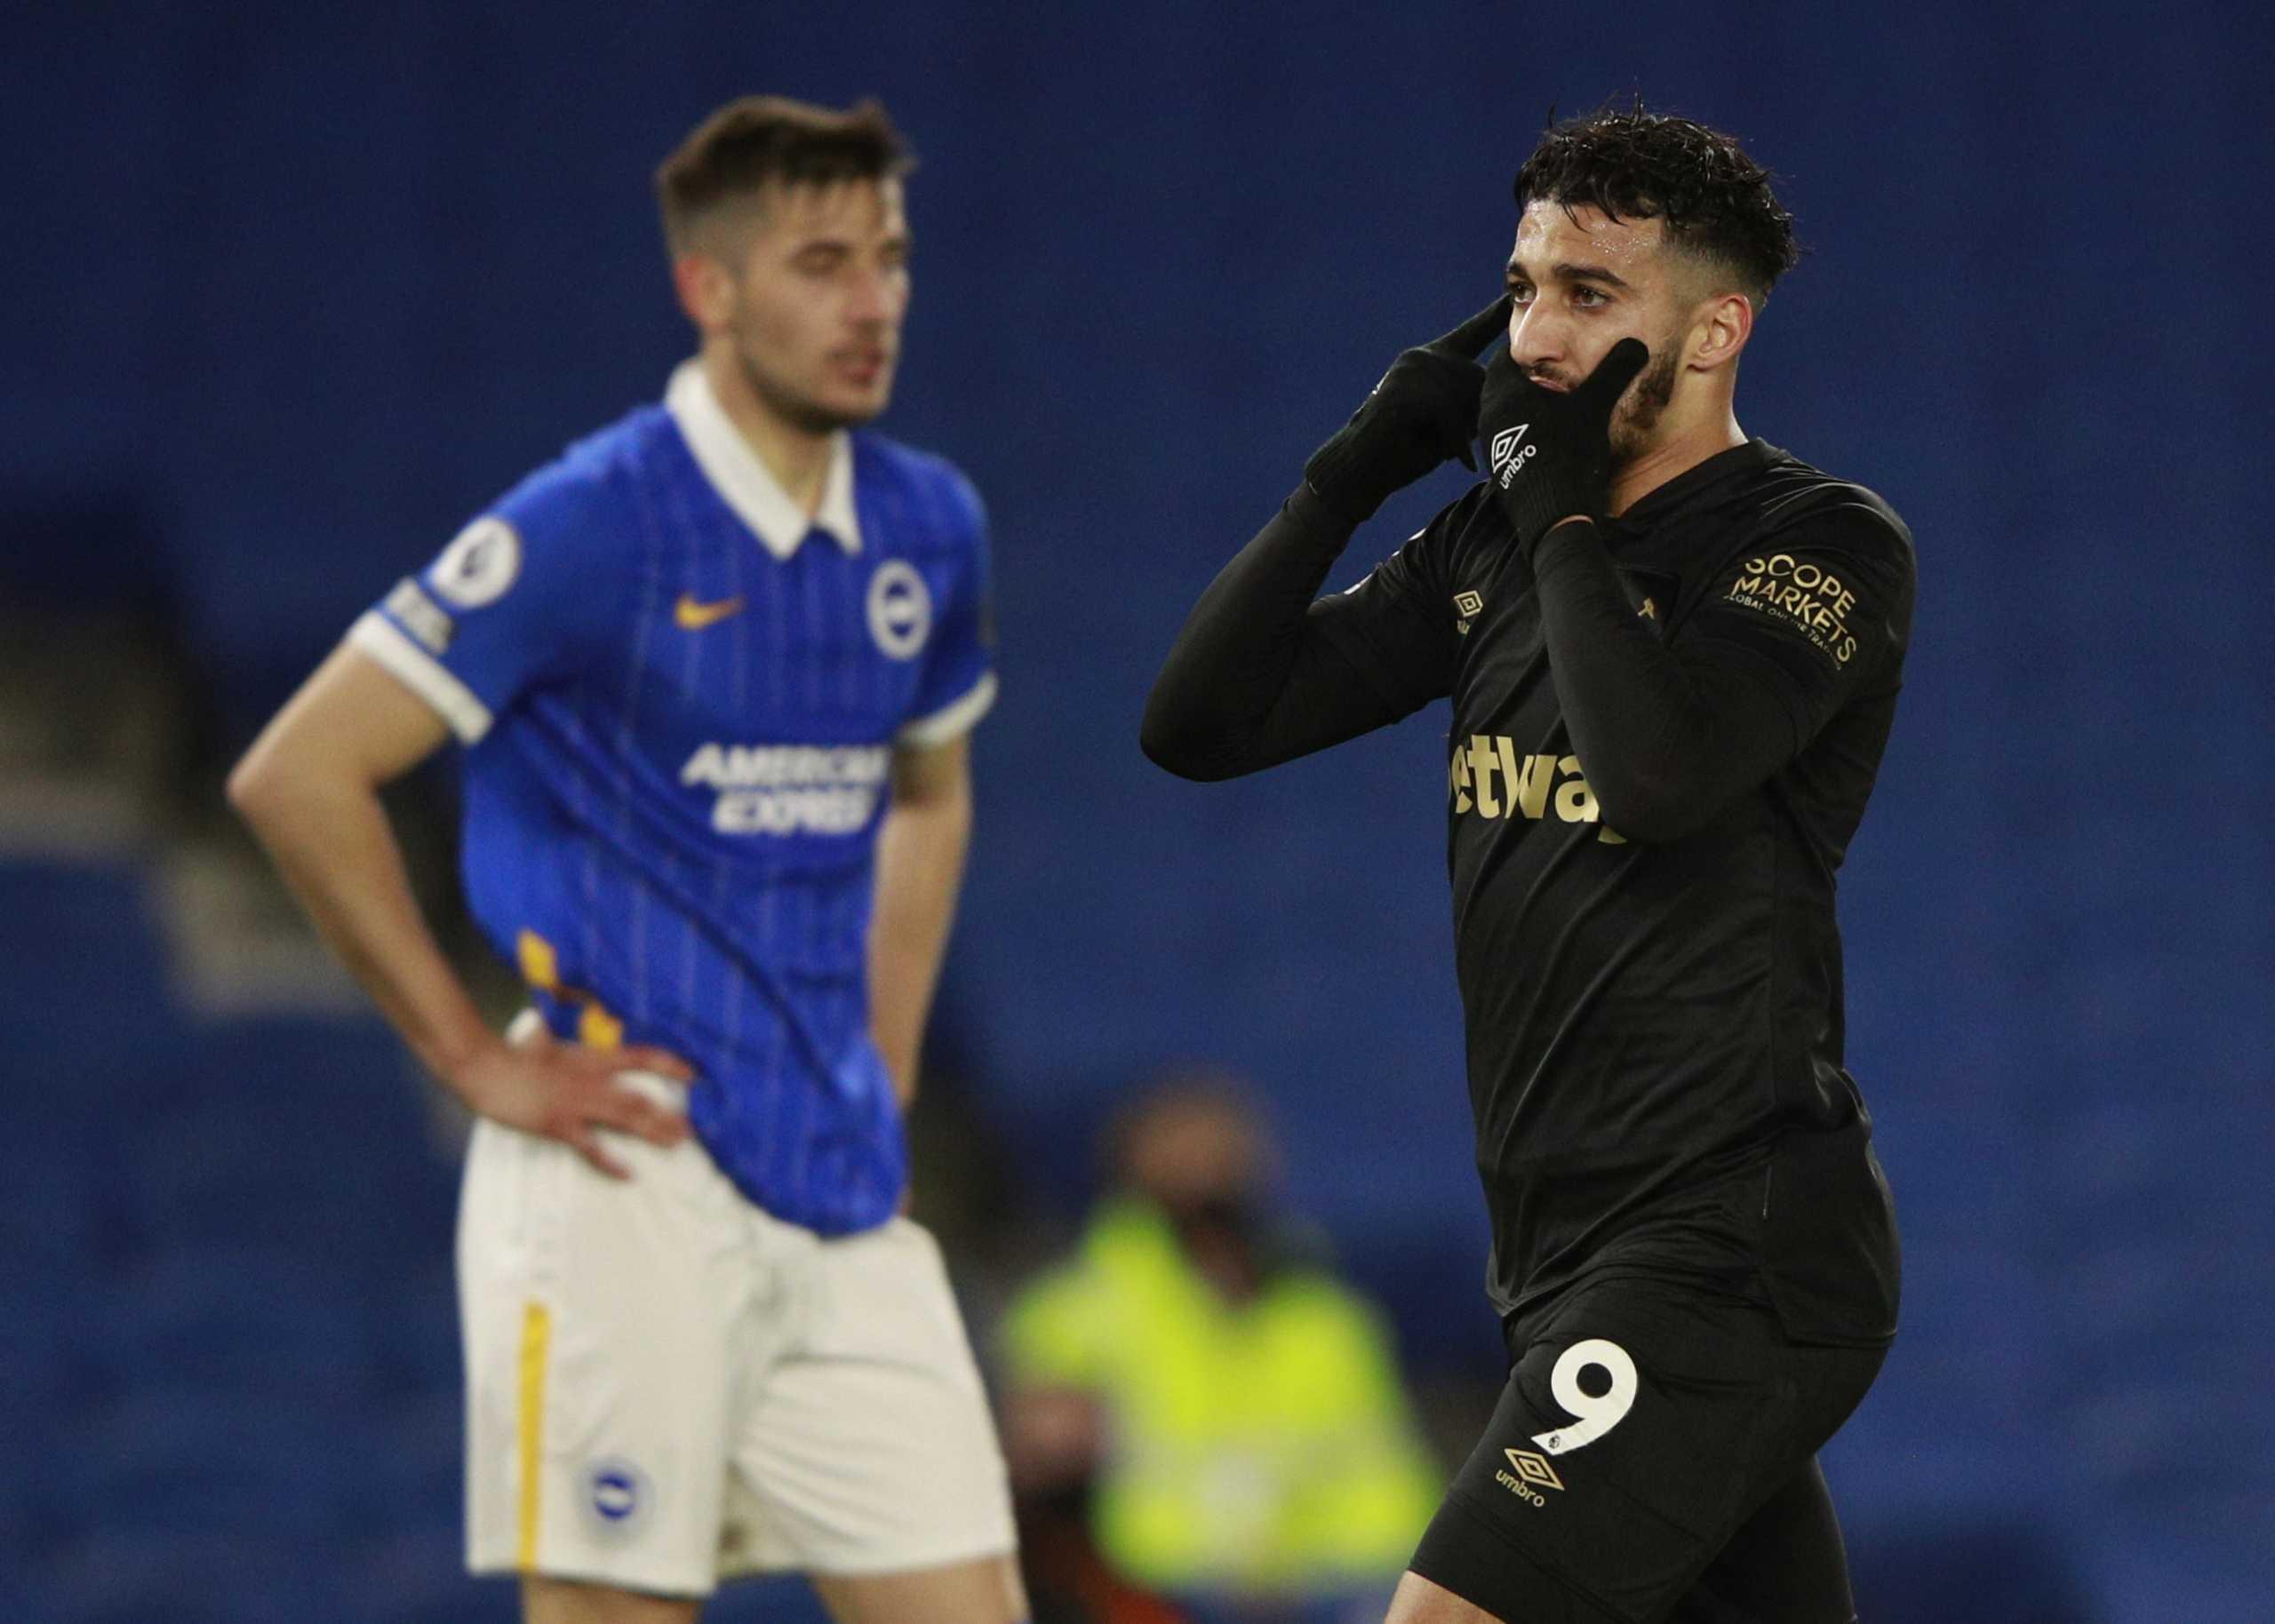 Premier League: «Κόλλησε» η Γουέστ Χαμ και κινδυνεύει να χάσει την Ευρώπη